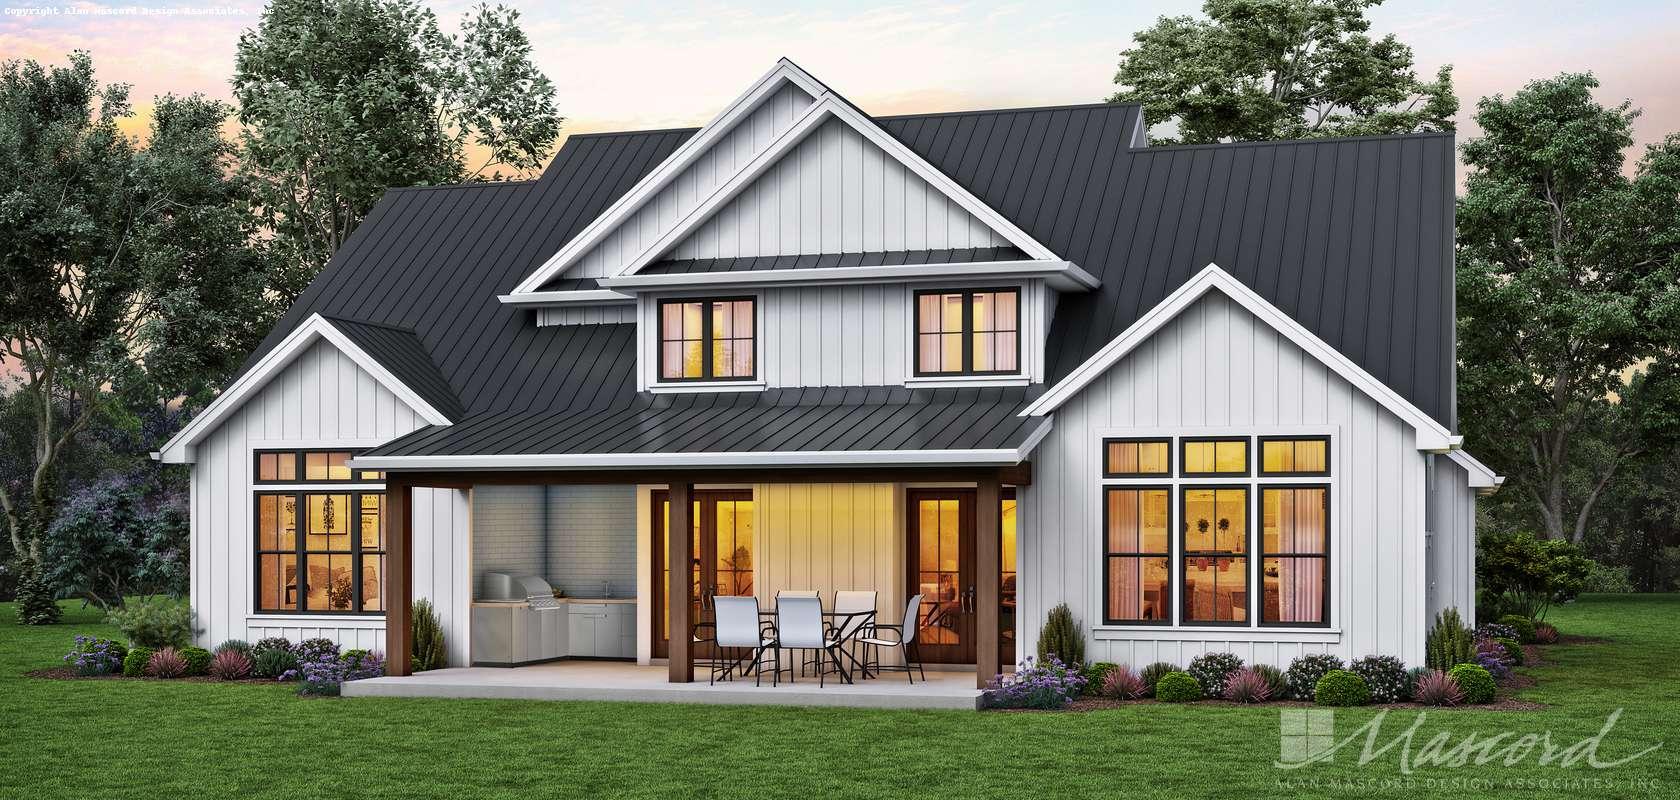 Mascord House Plan 23117: The Sanada